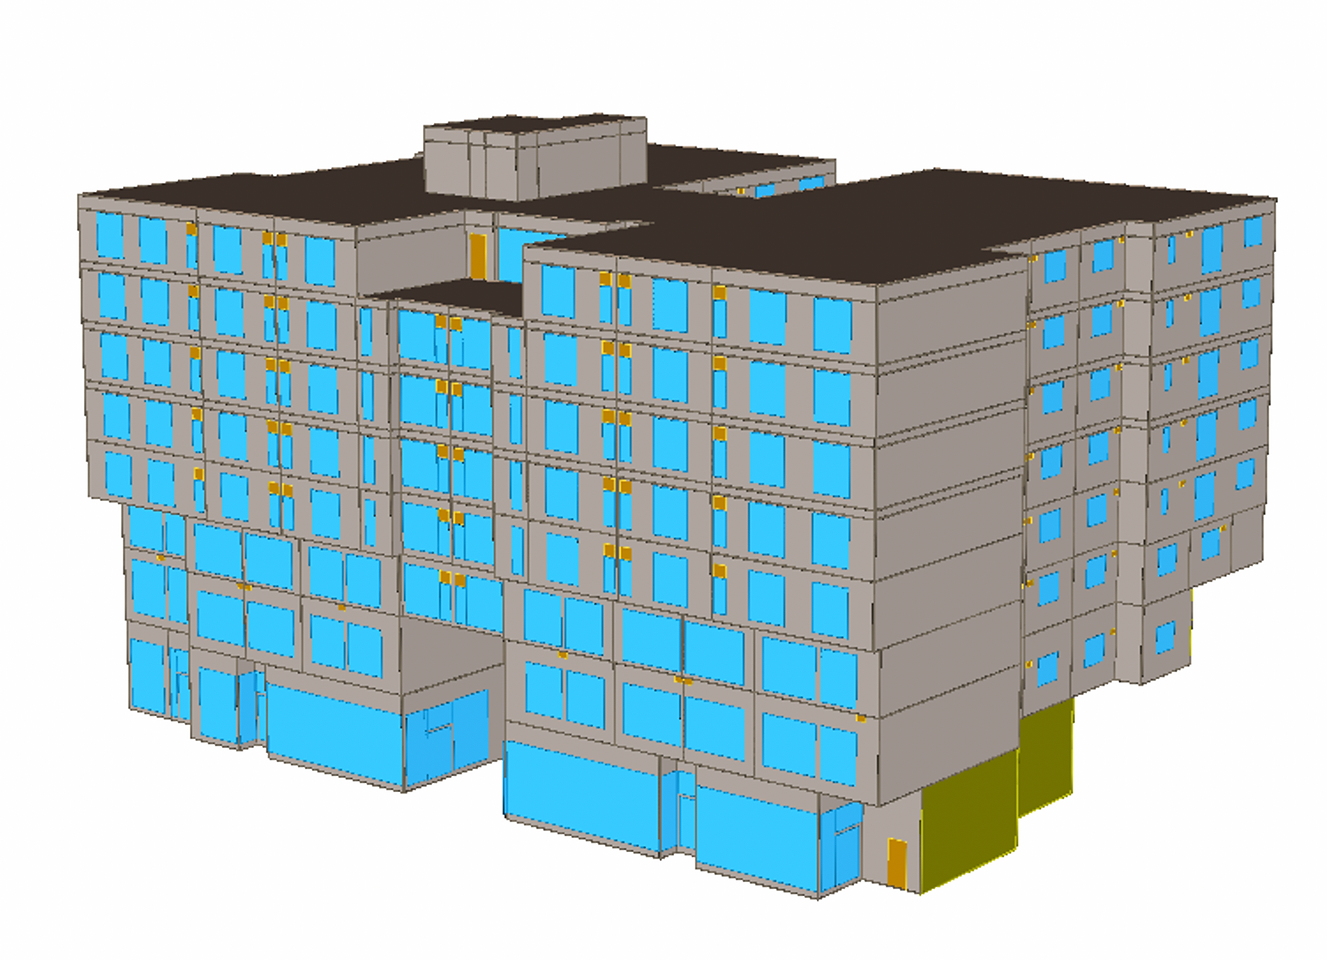 Market Square Apartments Project Address: 1540-1548 Market street, Tacoma, WA 98402